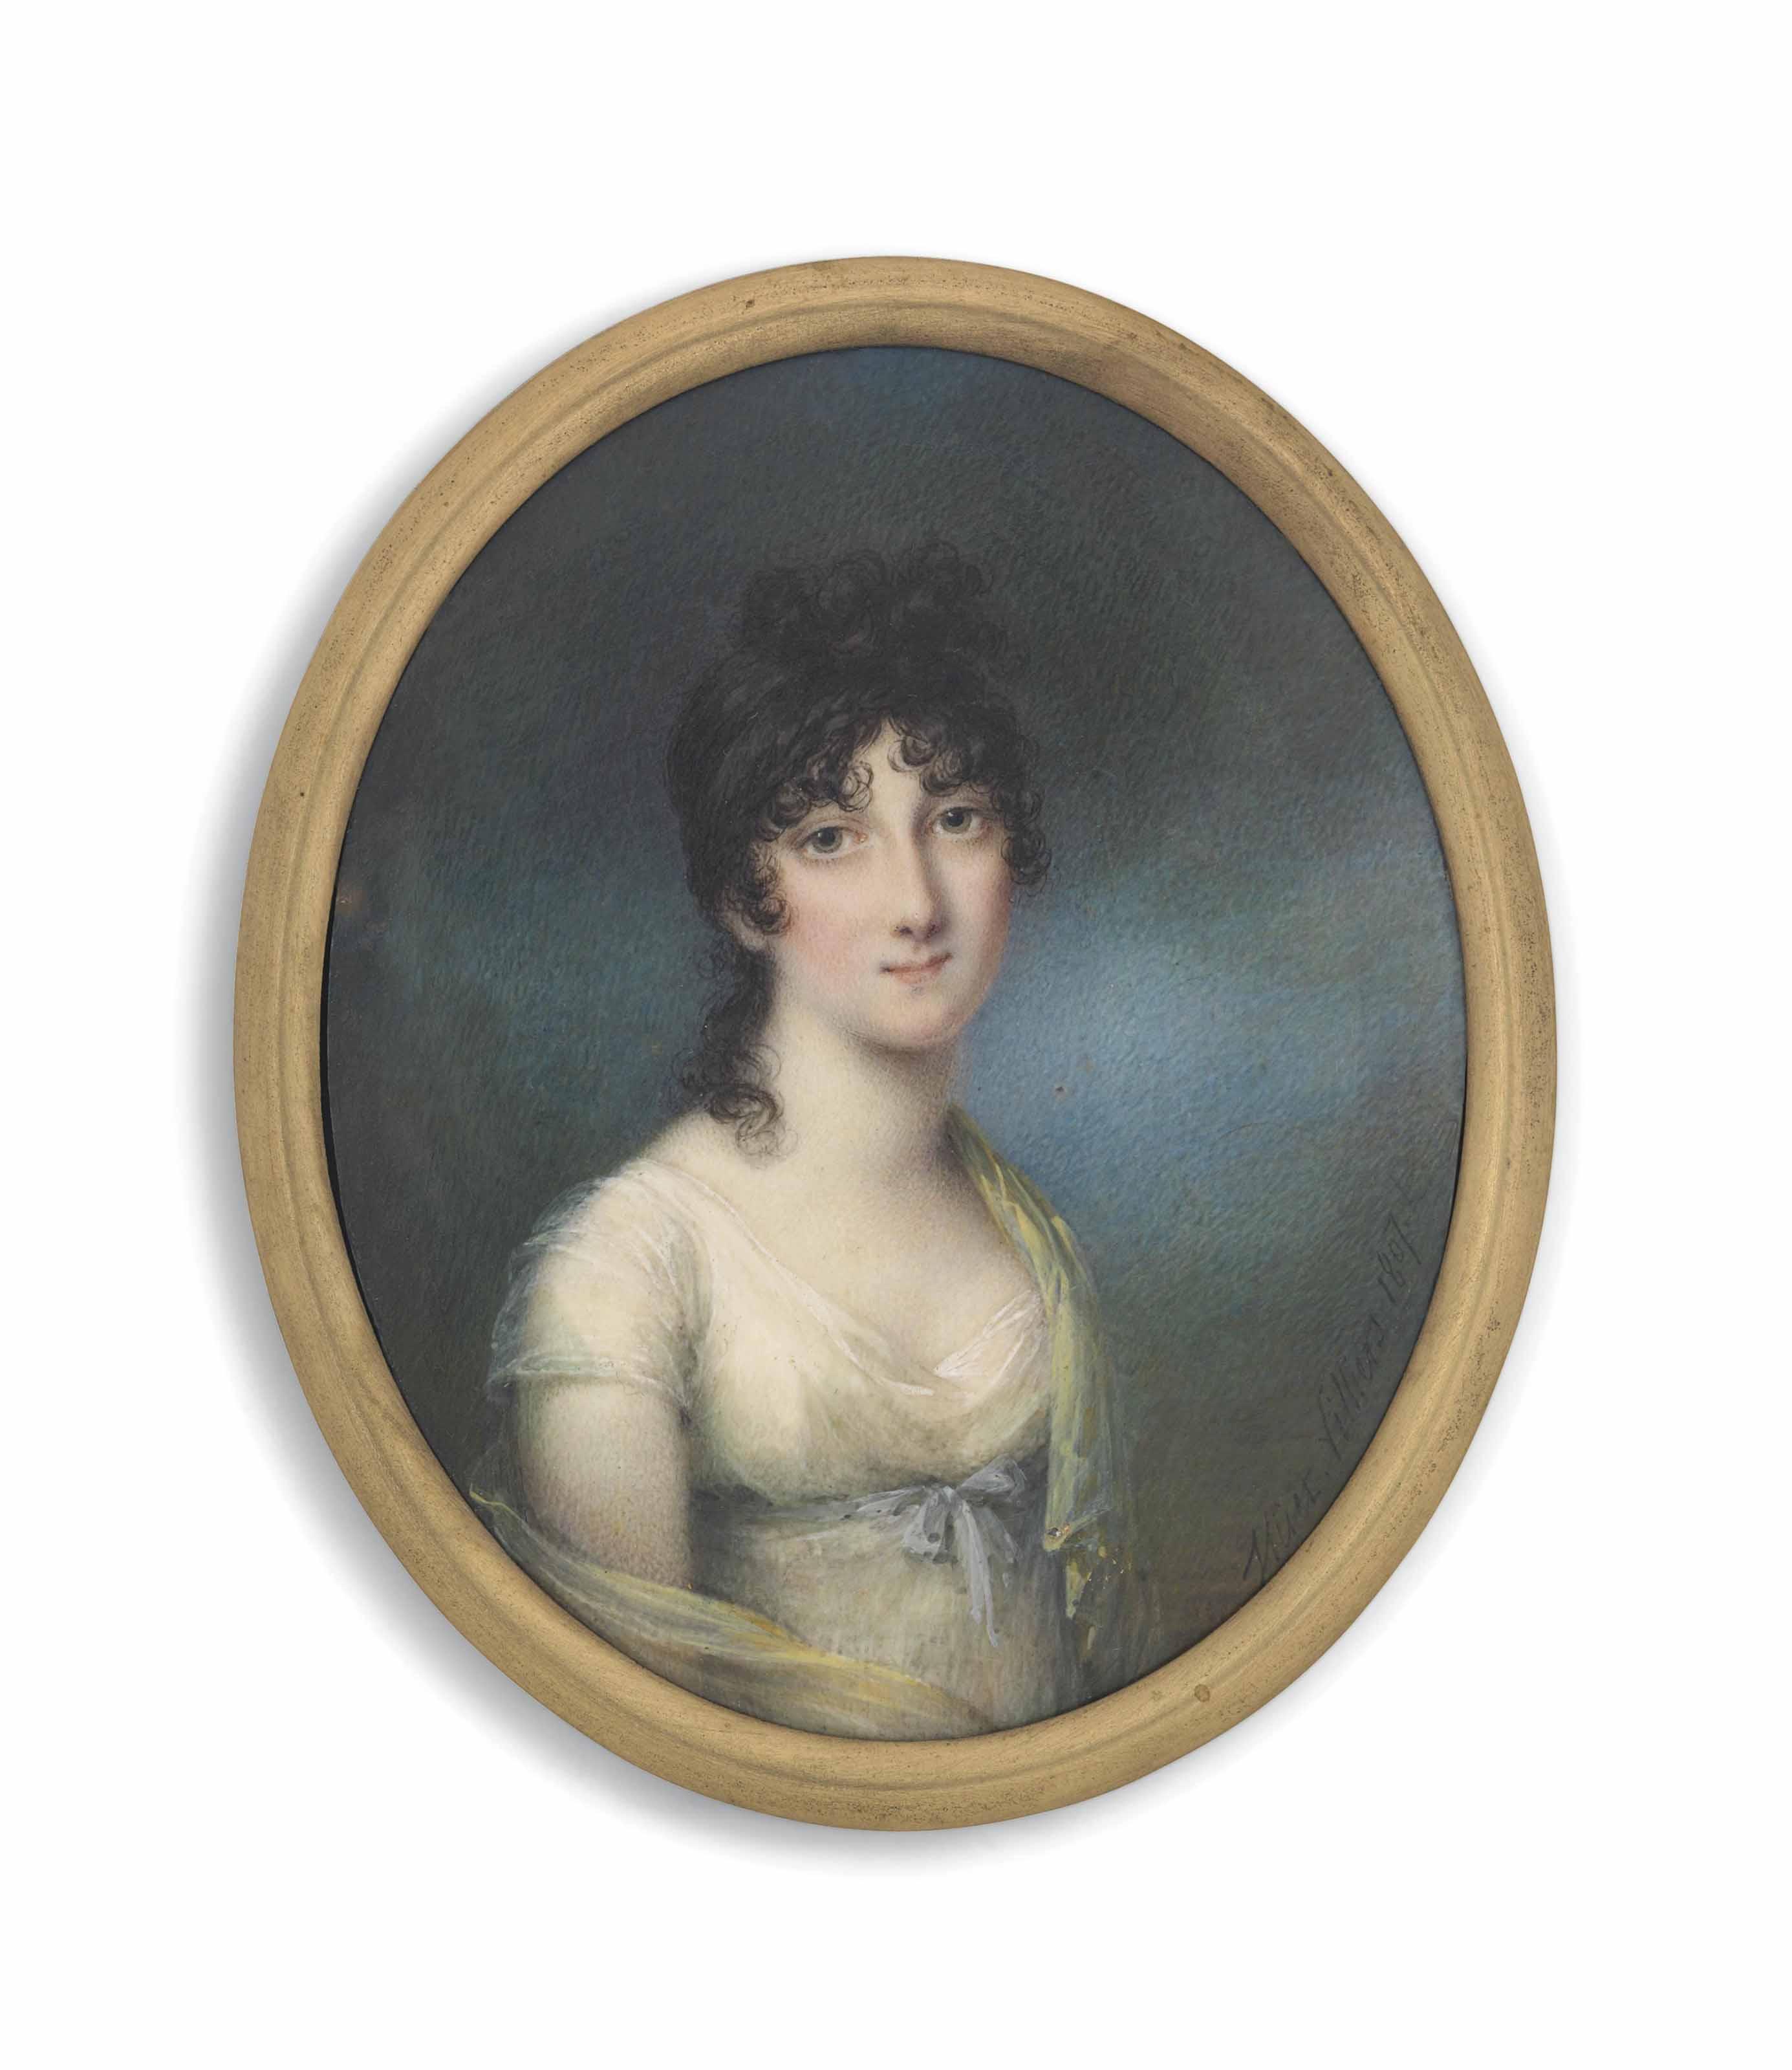 JEAN-FRANÇOIS-MARIE HUET-VILLI